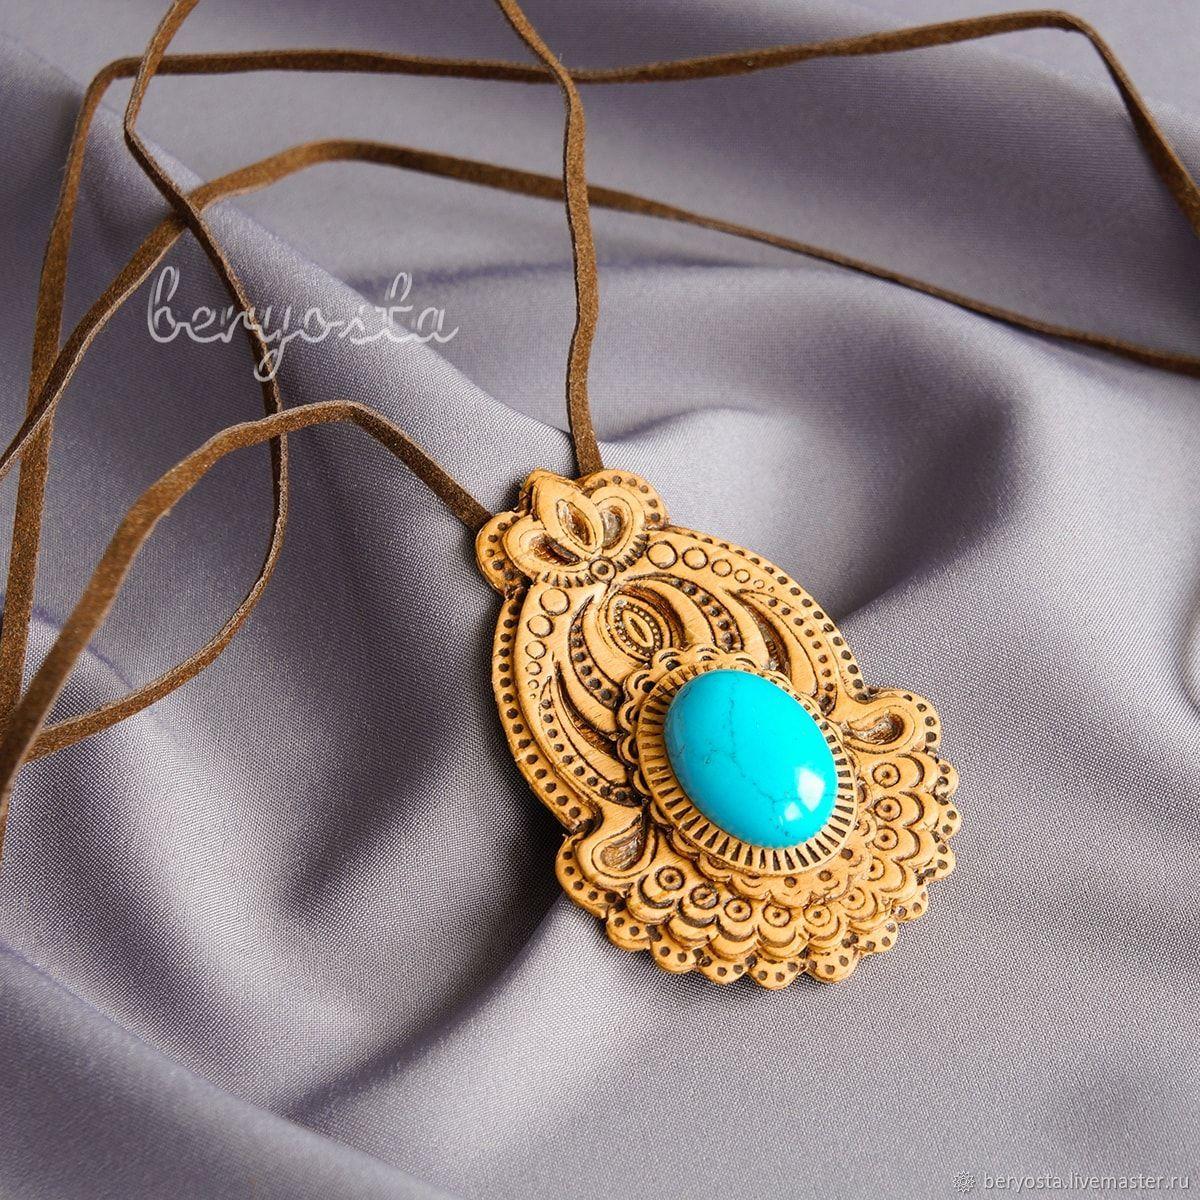 Pendant made of birch bark 'Tulip' with turquoise. pendant made of wood, Pendants, Novosibirsk,  Фото №1